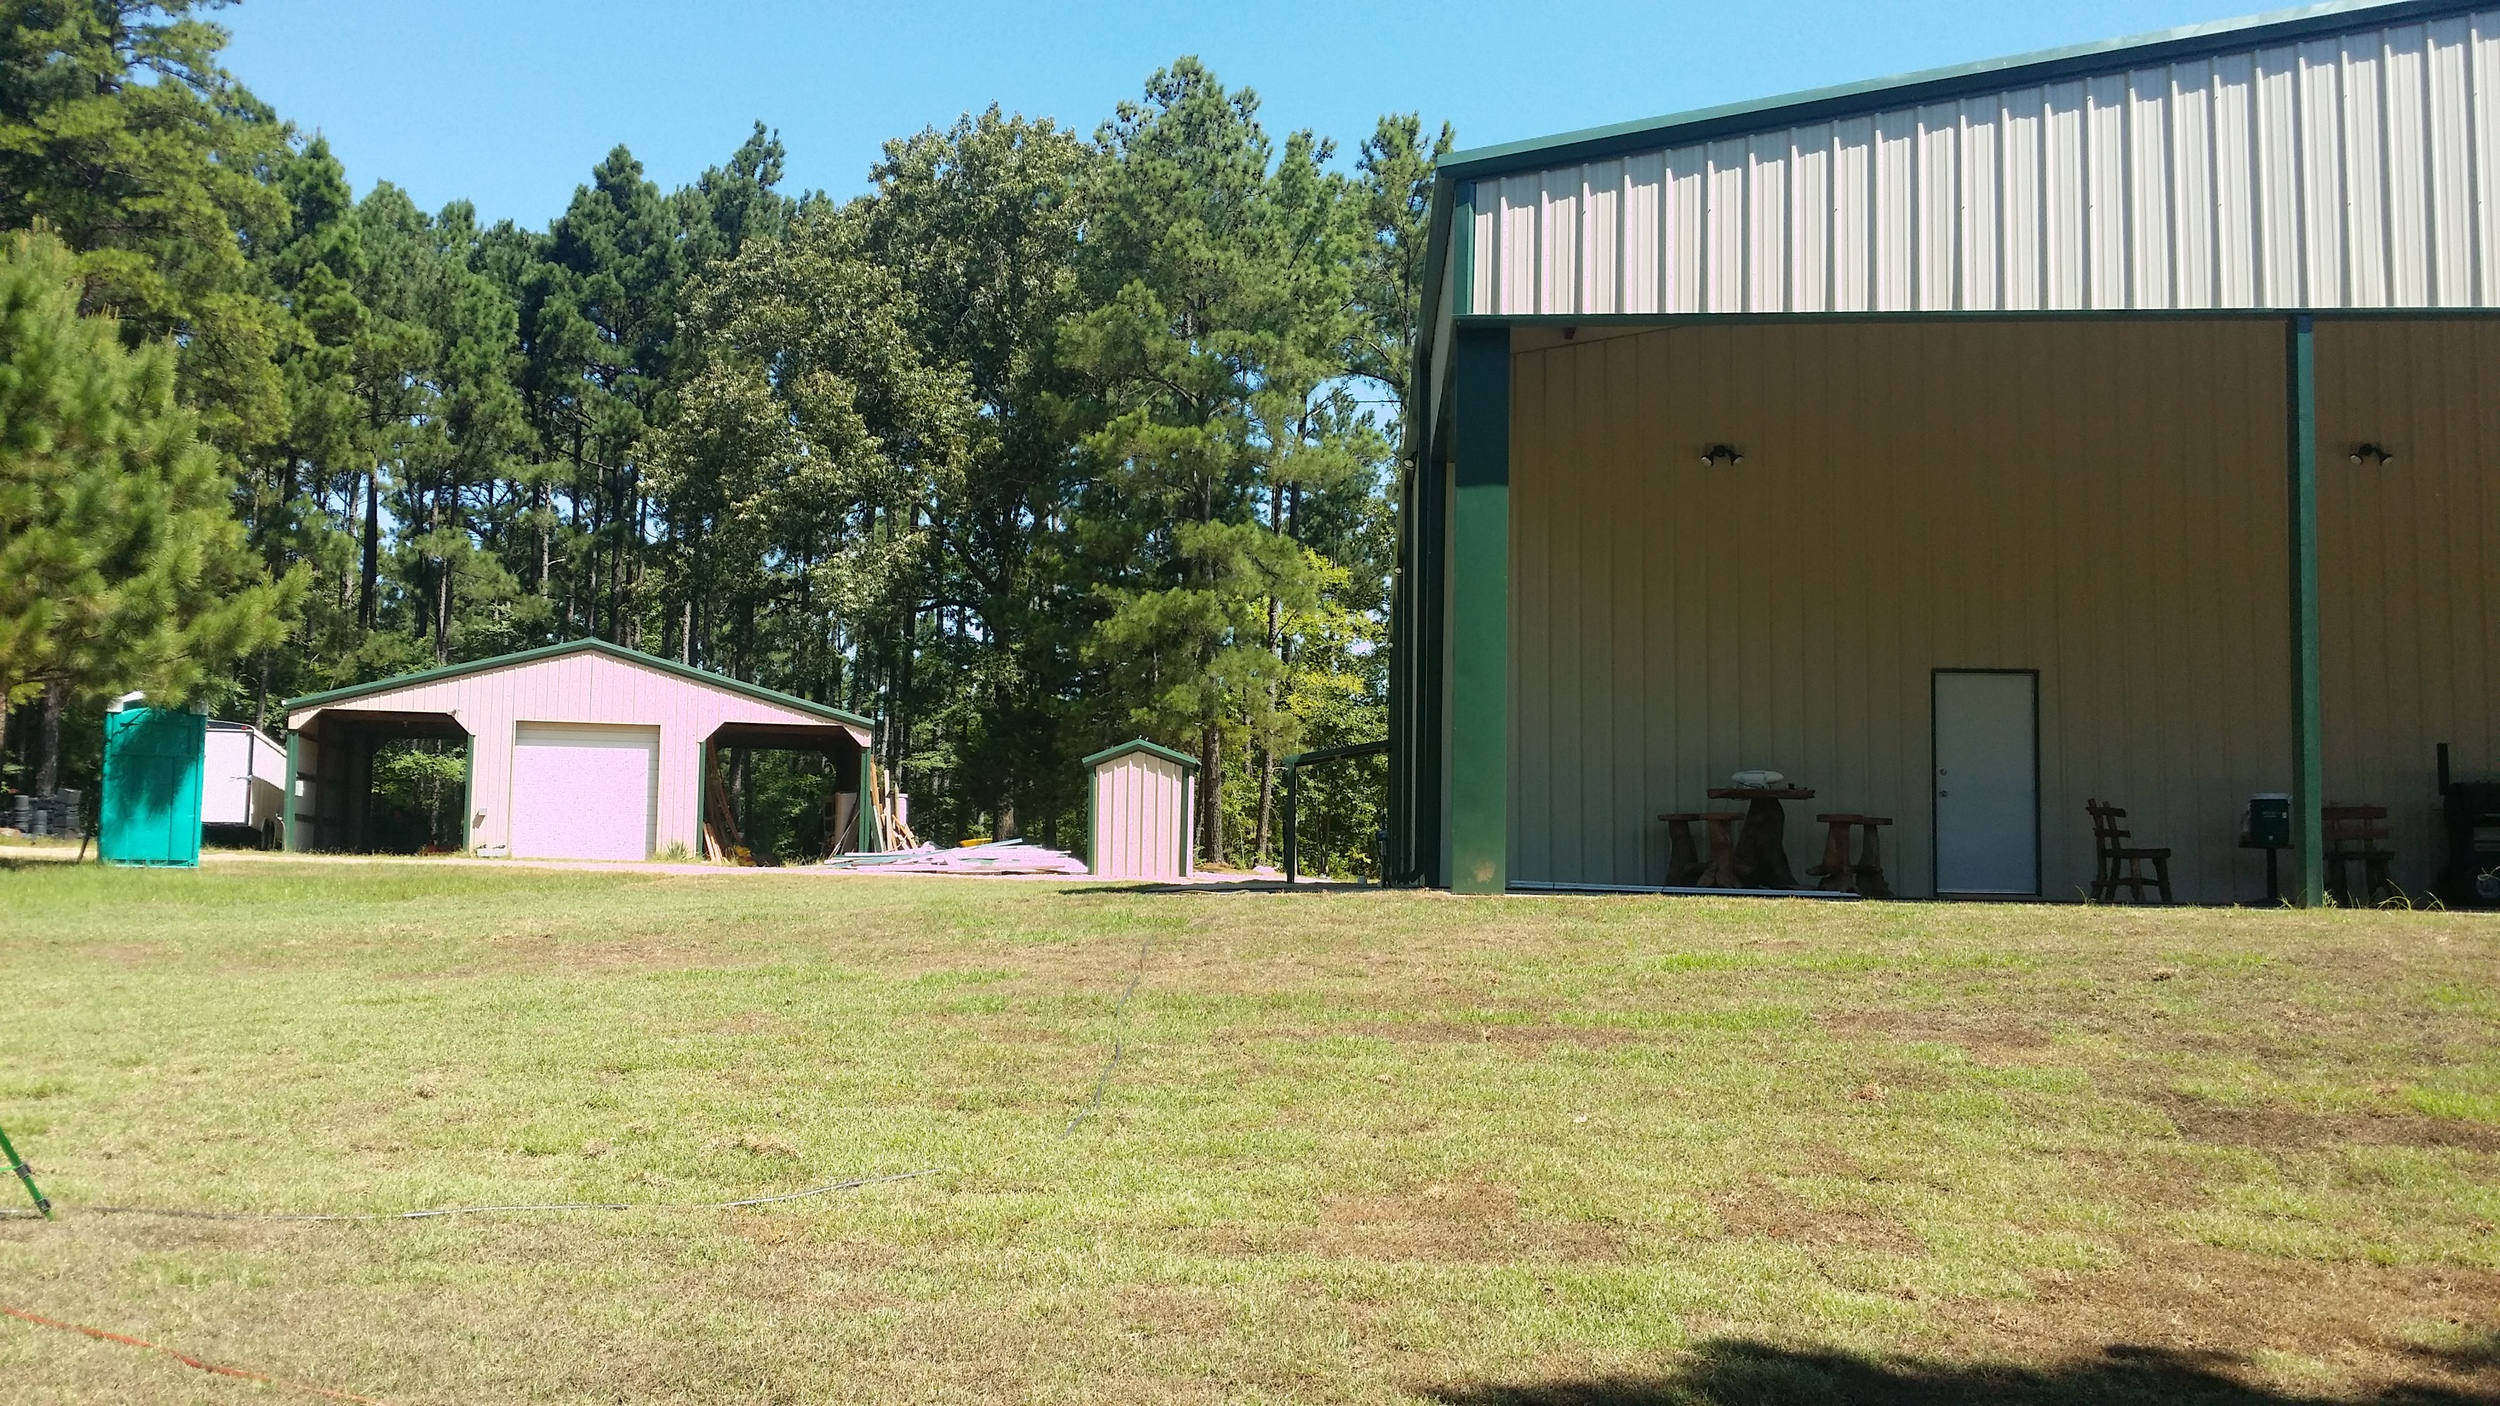 Storage Building Remodel